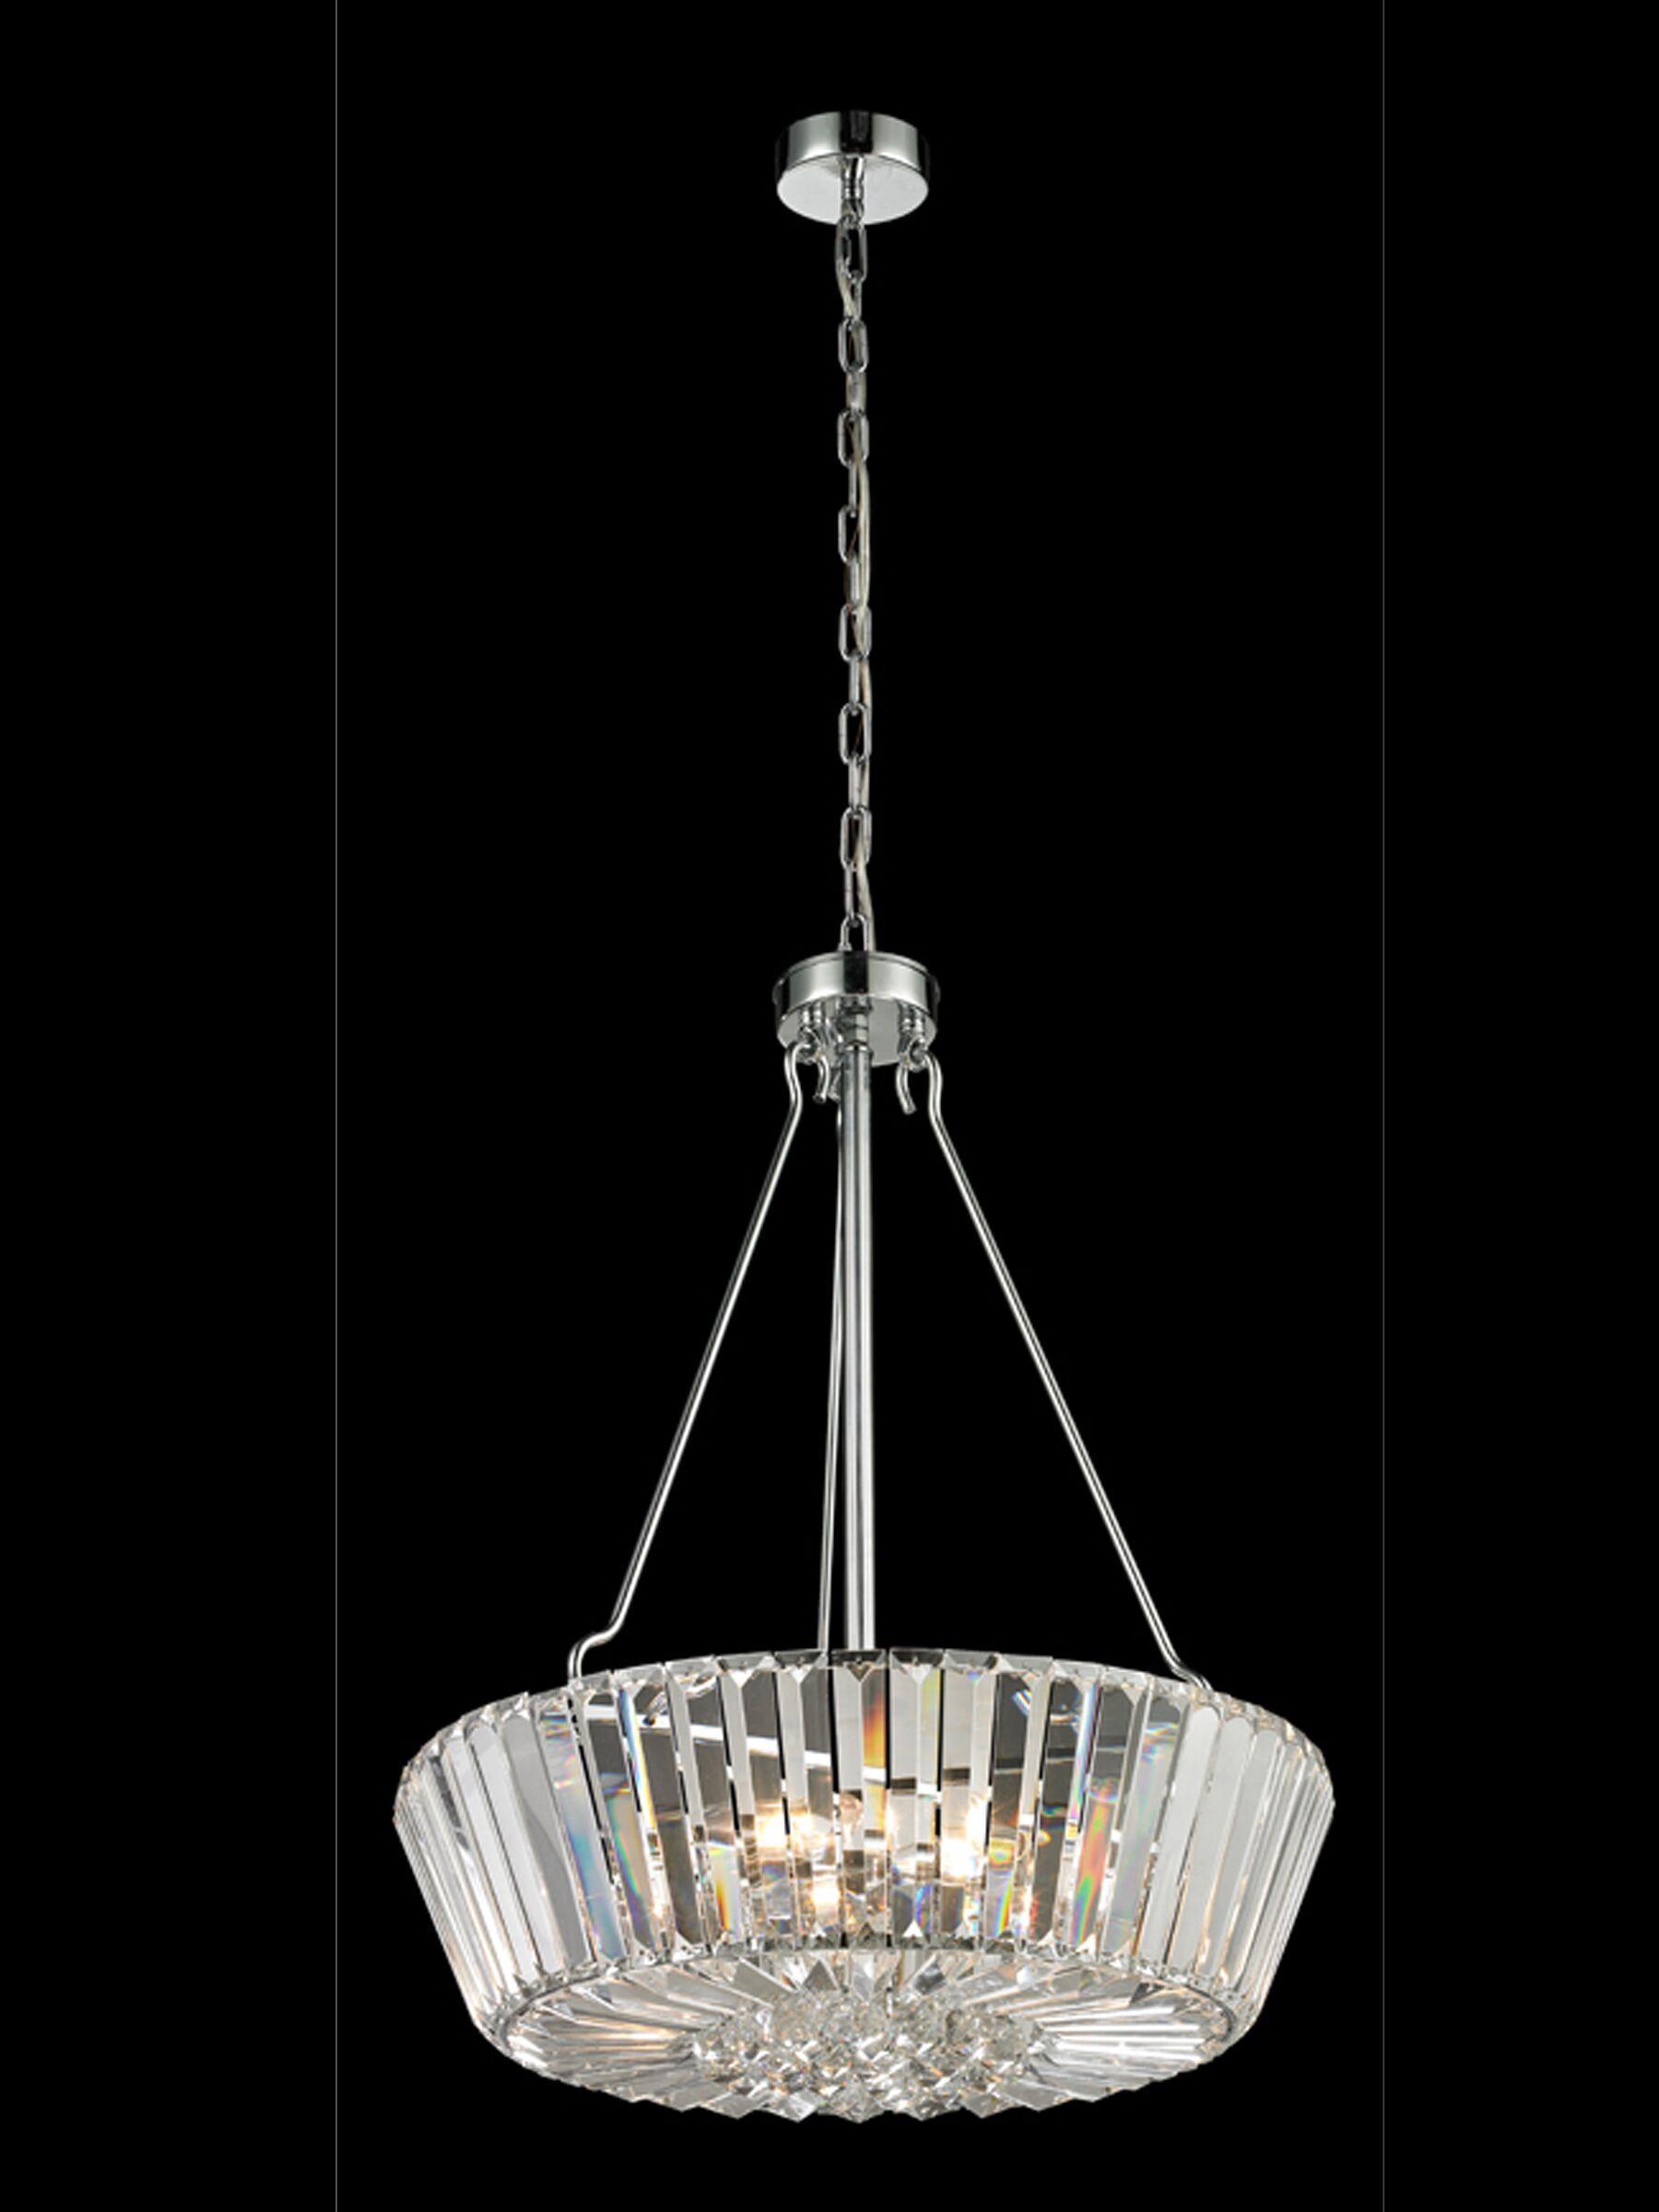 Dunham 5-Light Crystal Chandelier